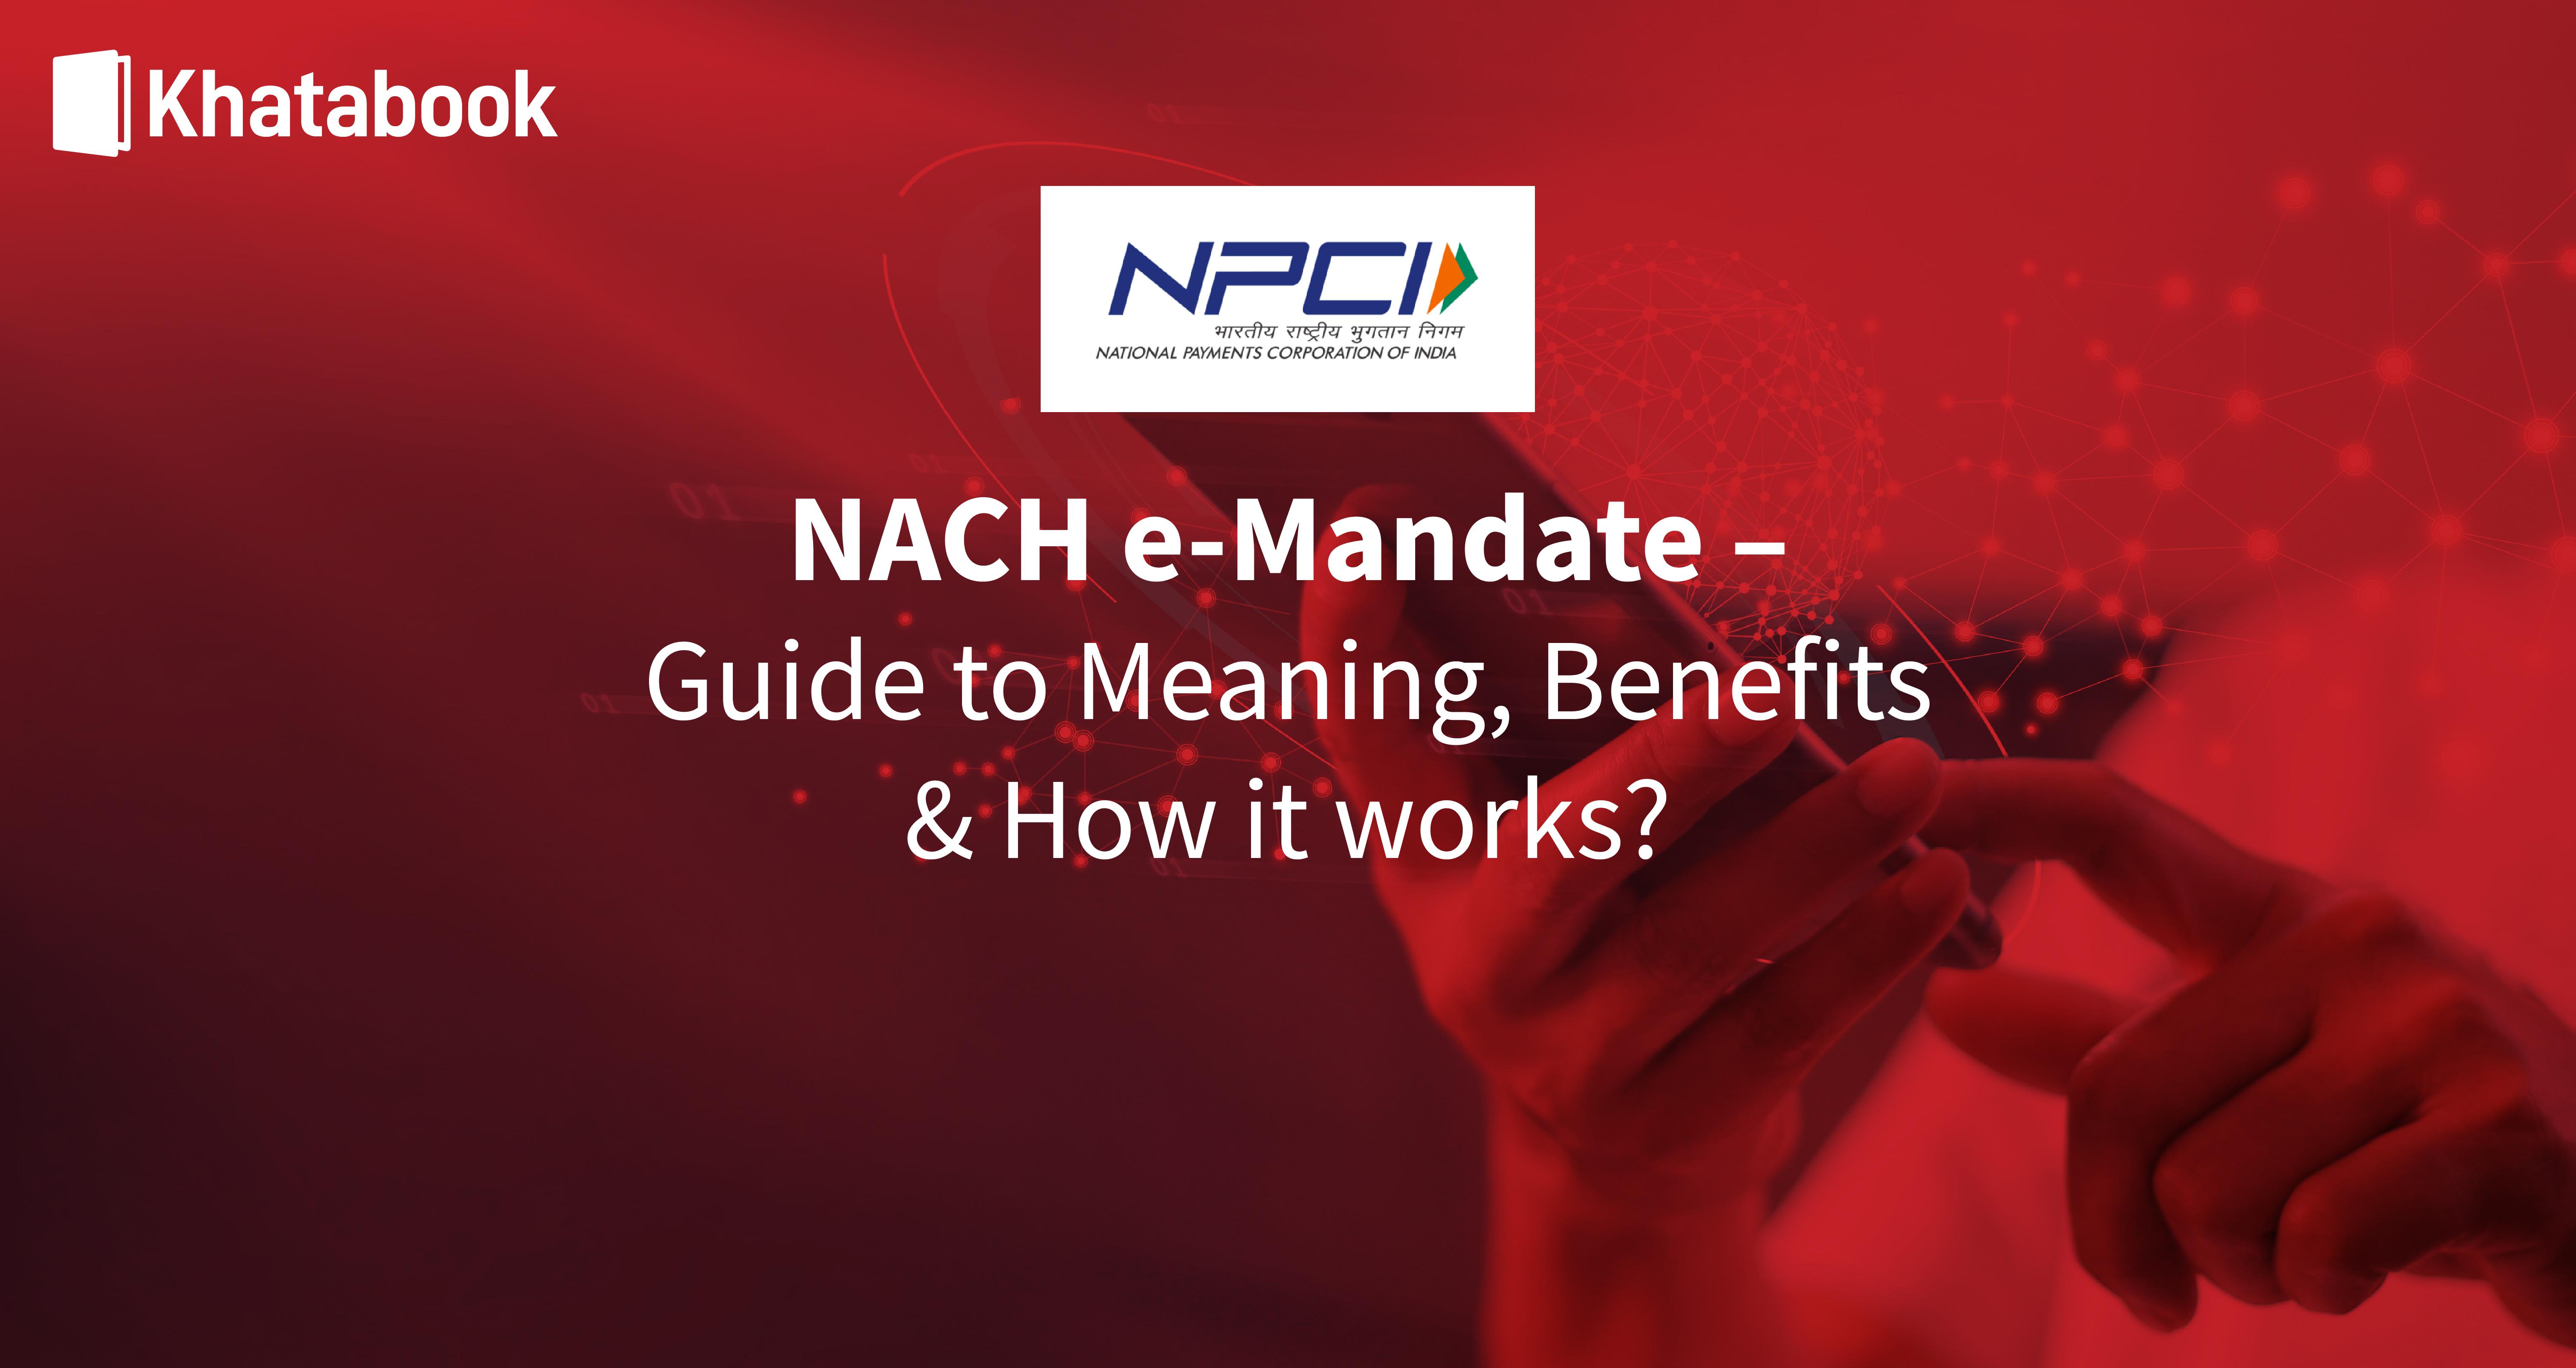 A Complete Guide to NACH e-mandate